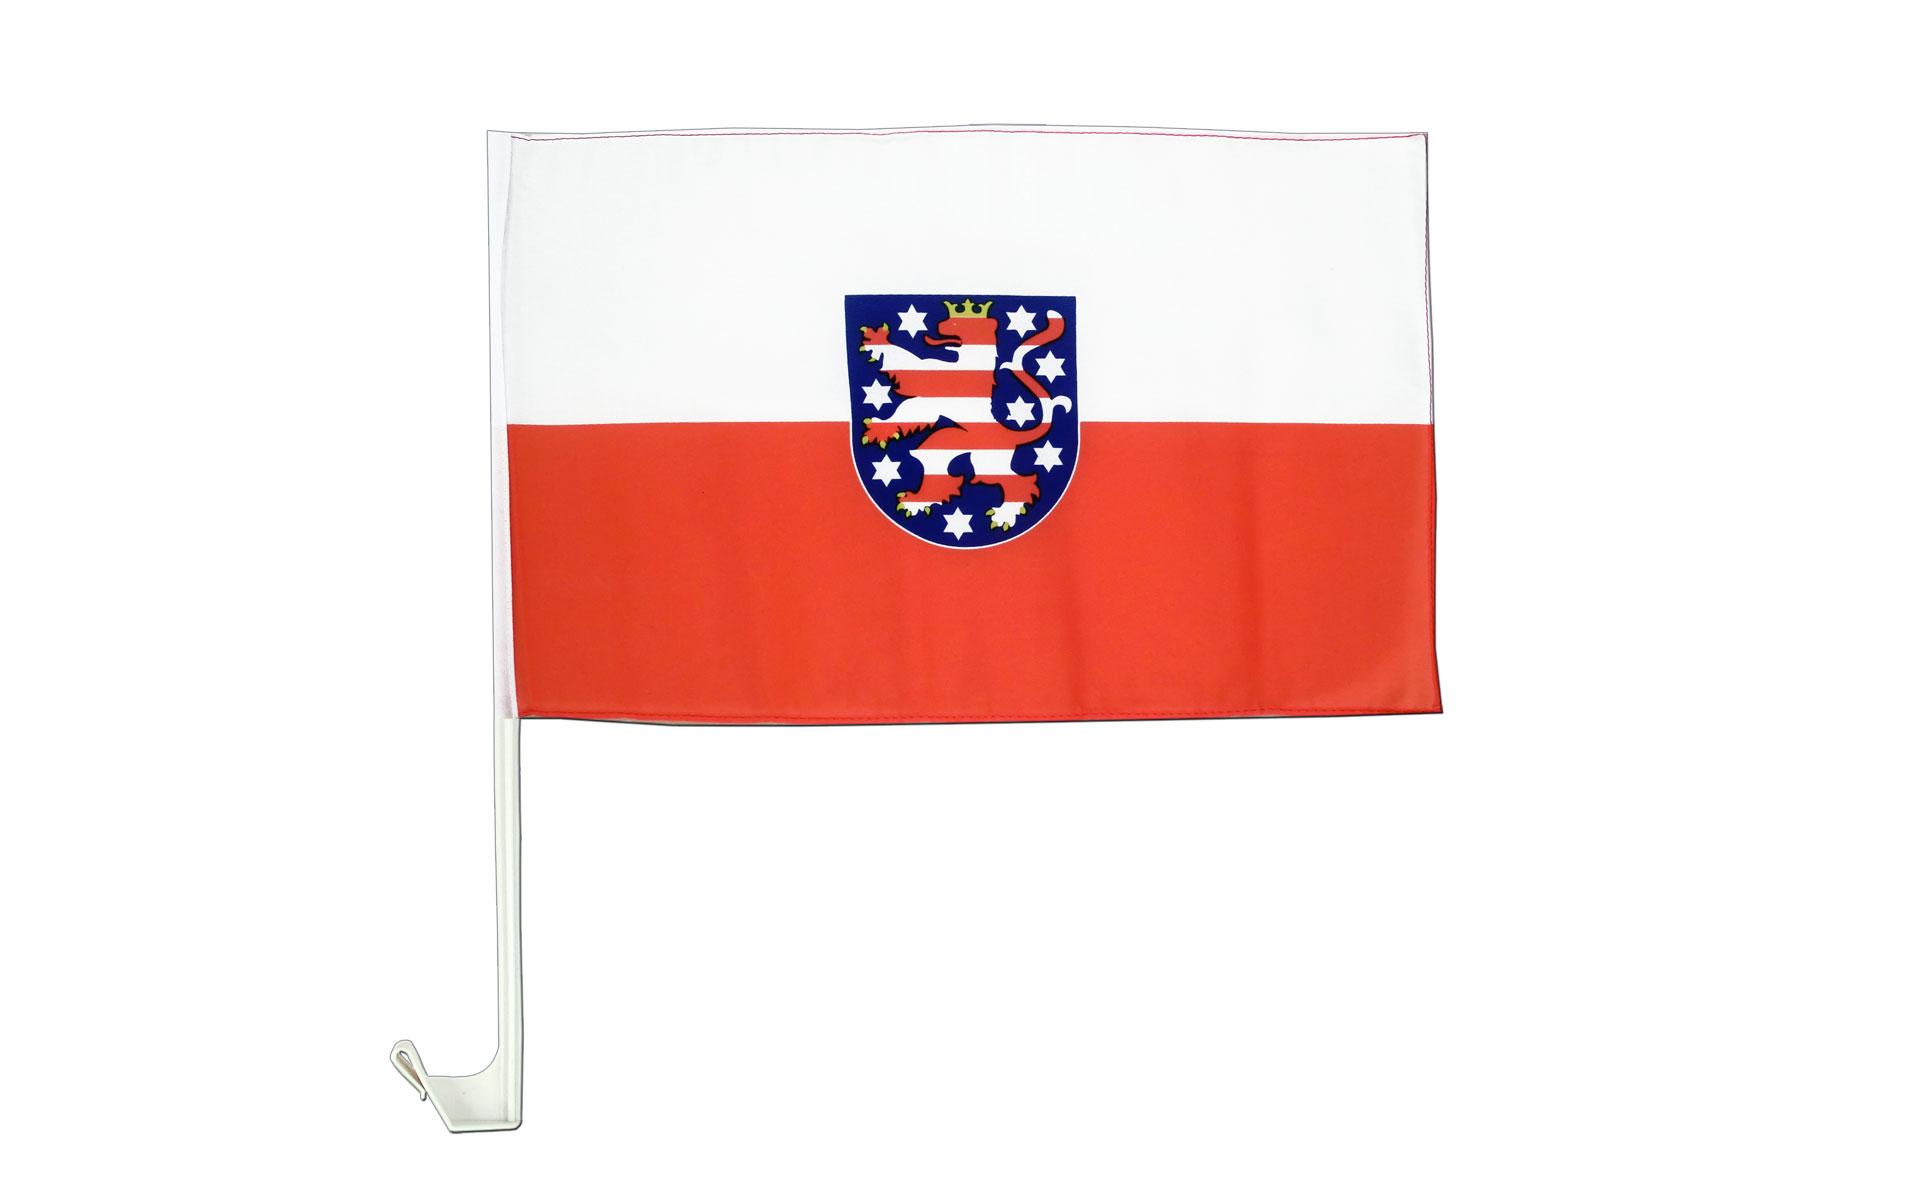 Thüringen Flagge Fahne Flaggen Hissflagge 150 x 90 cm cm